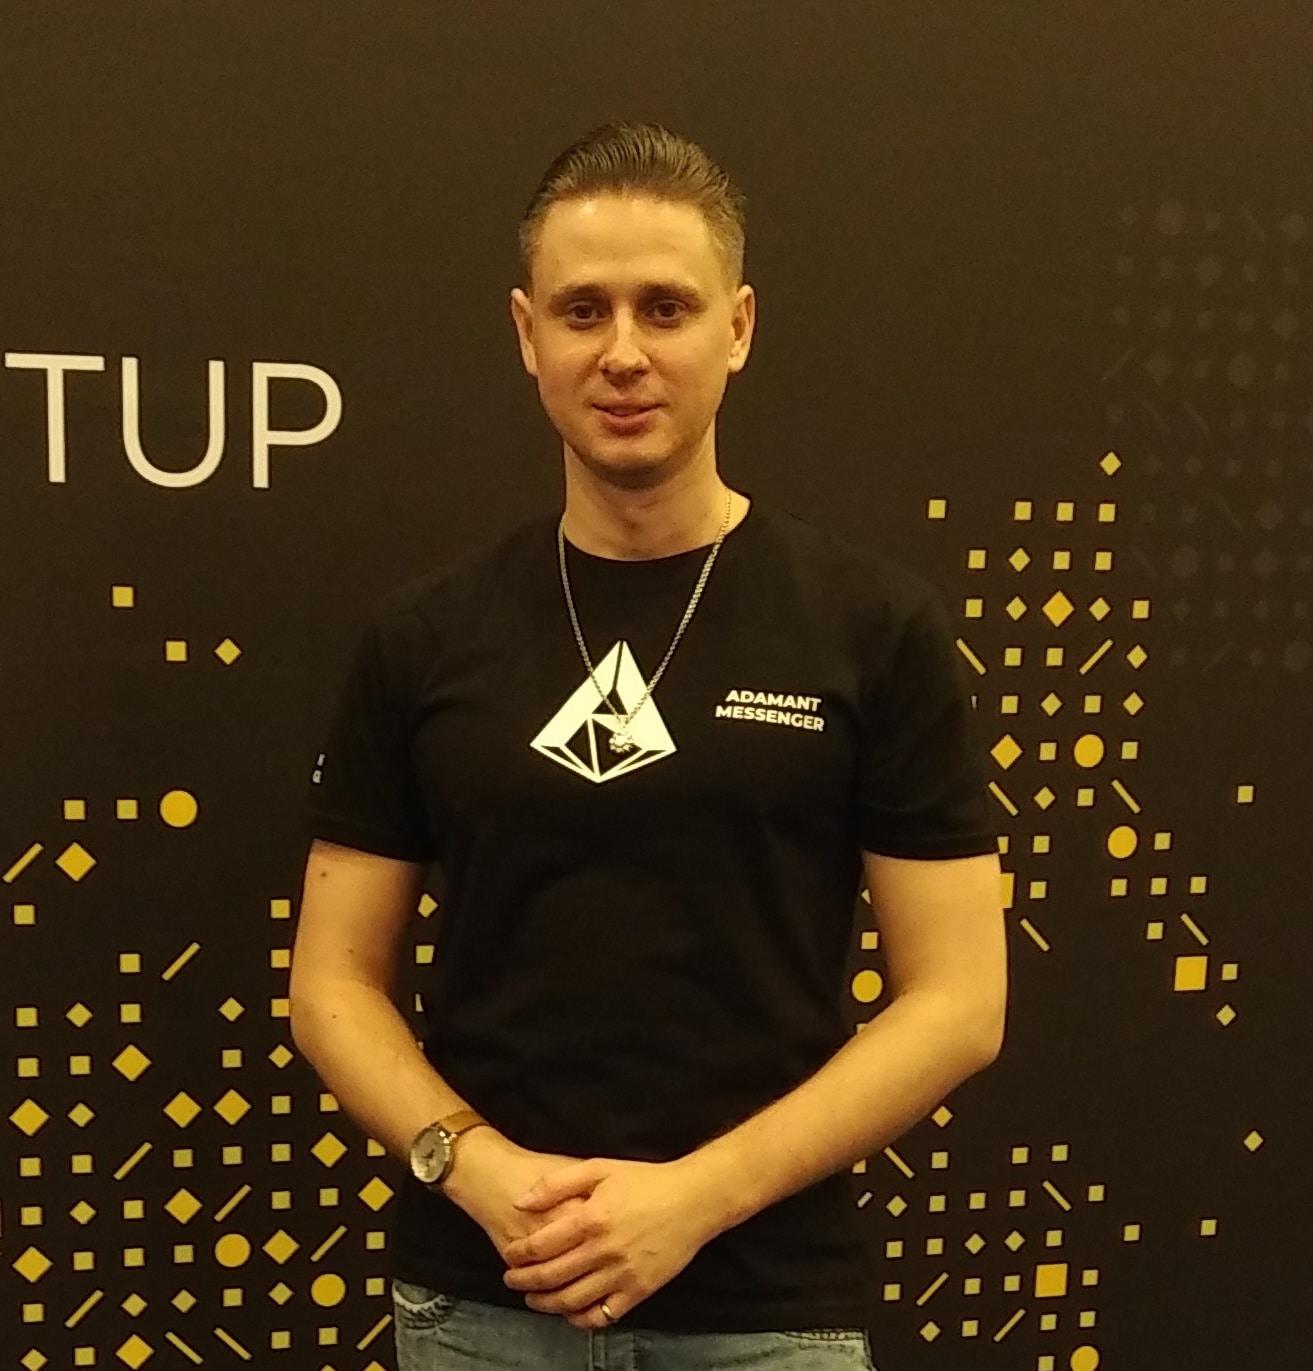 Aleksei Lebedev ADAMANT Messenger